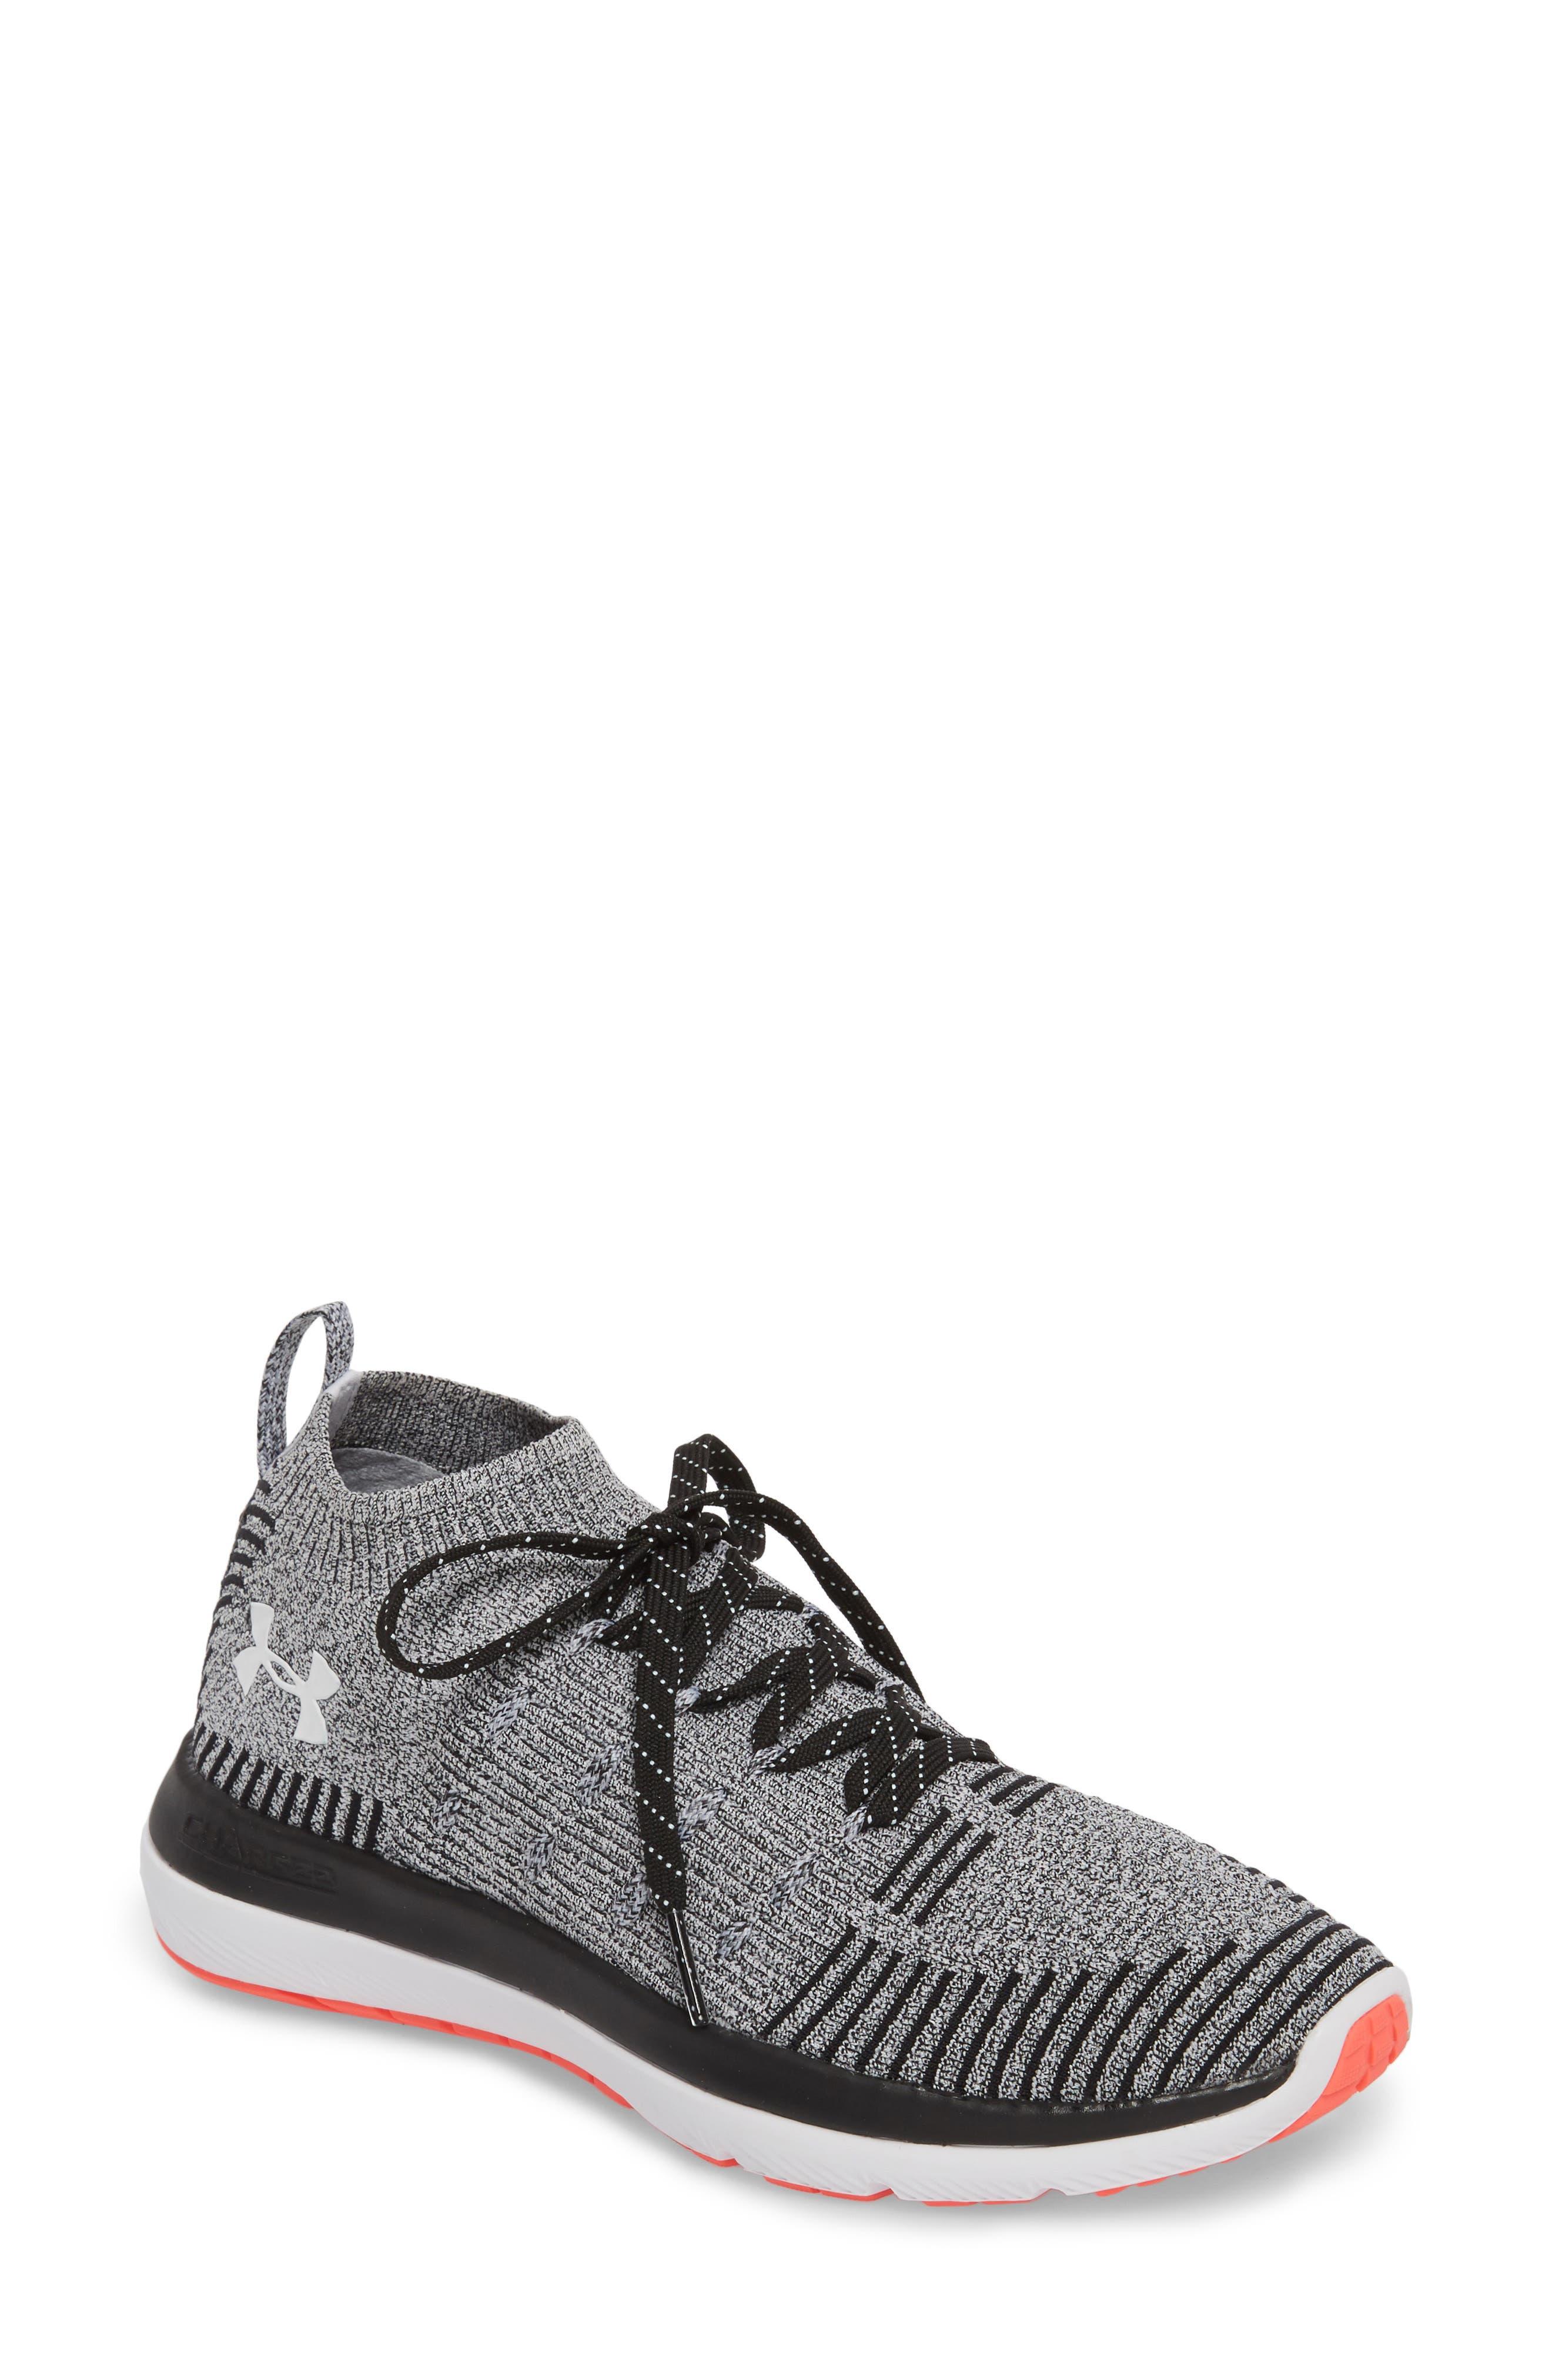 Slingflex Rise Sneaker,                         Main,                         color,